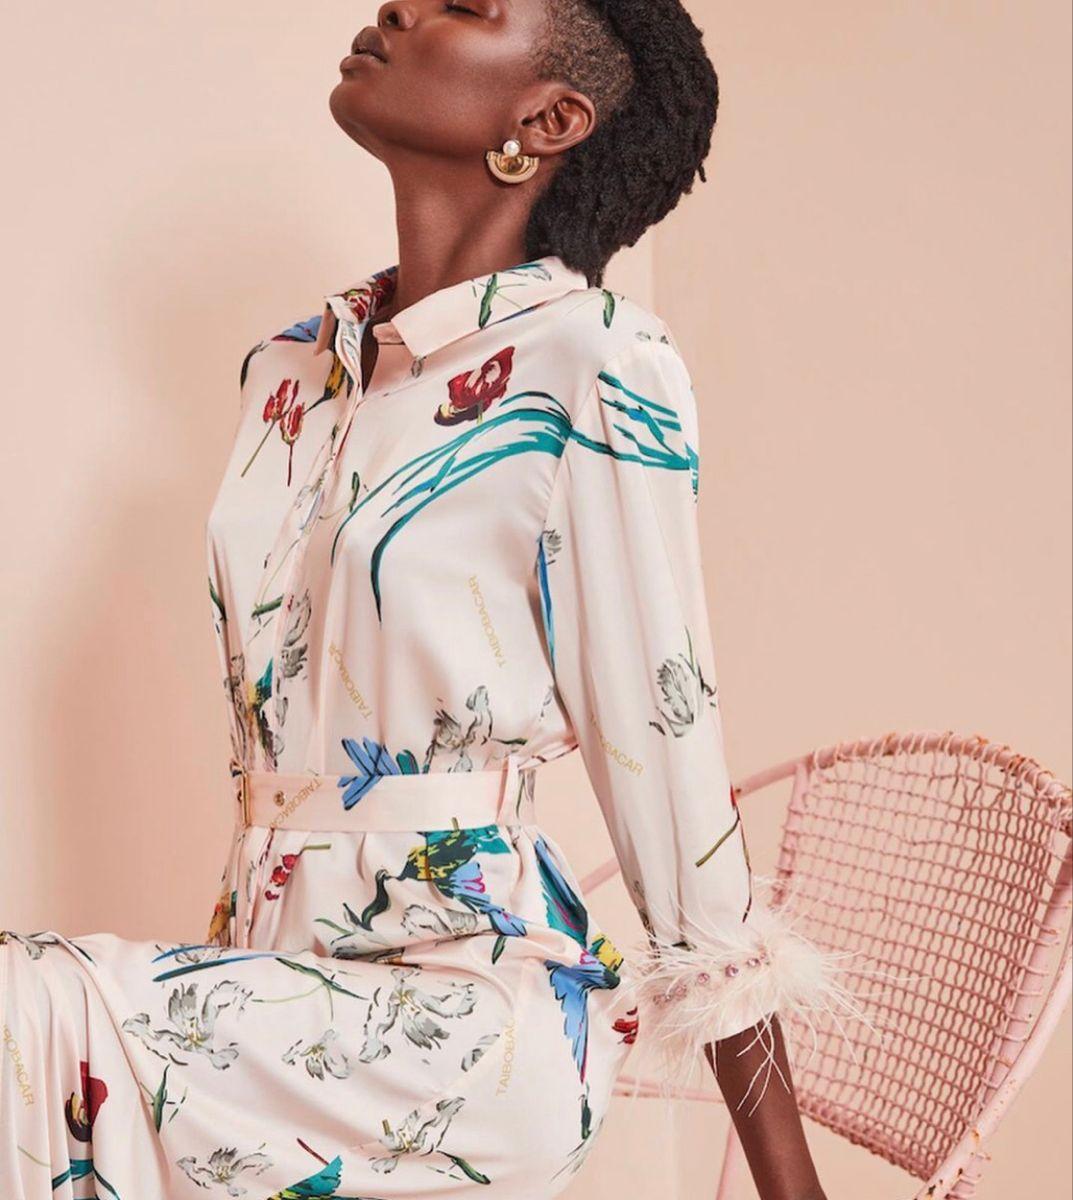 Taibo Bacar in 2020 Fashion, African design, African print